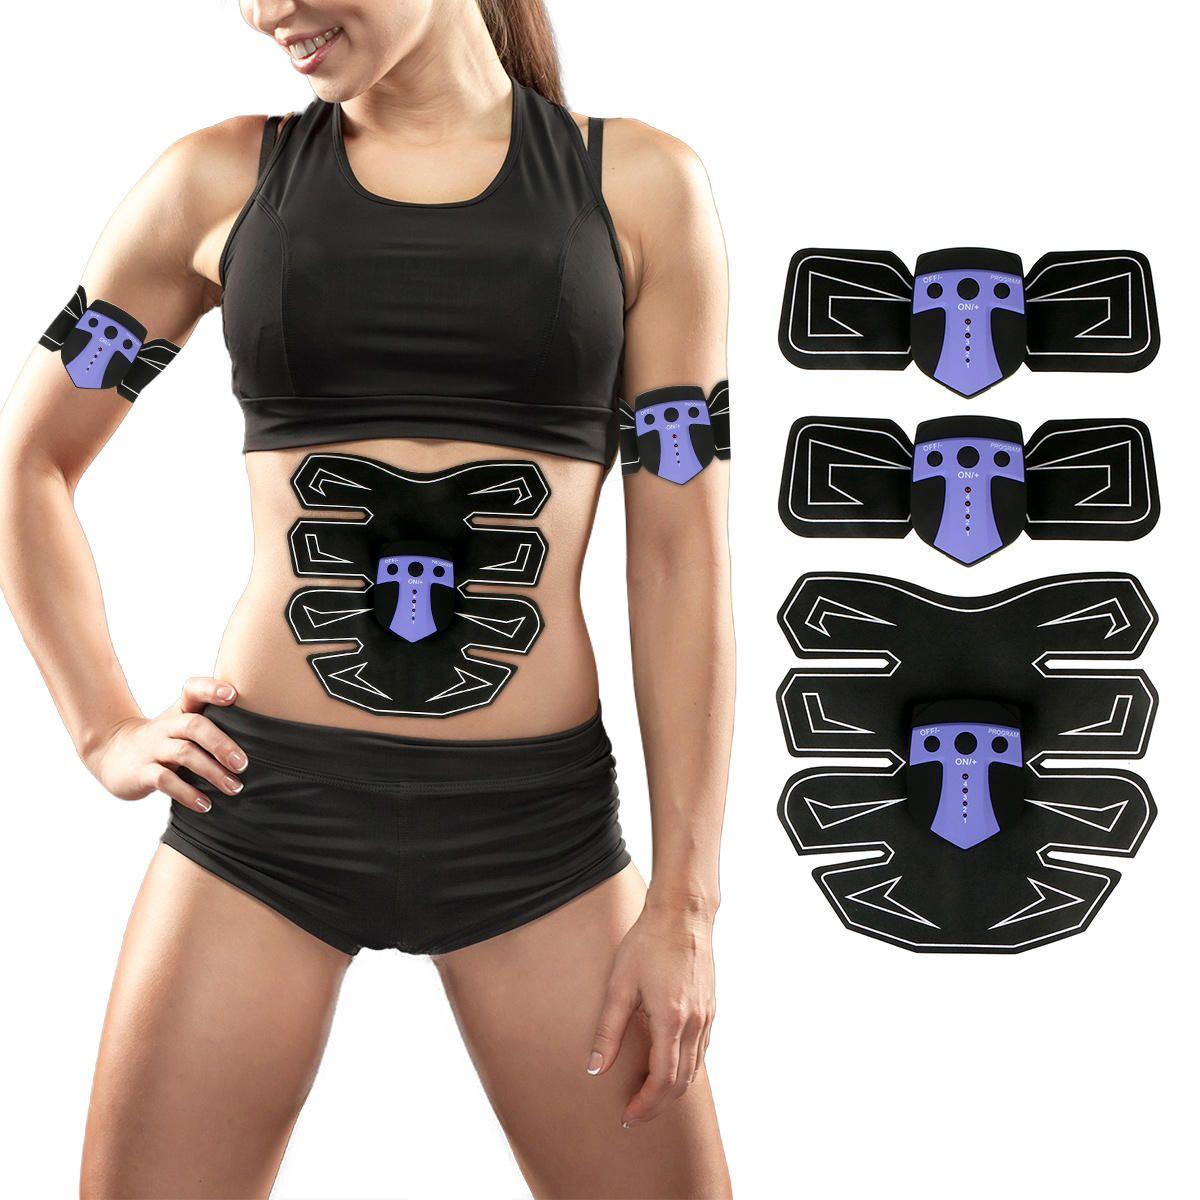 Us 19 99 Abdomen Arm Muscle Ems Training Gear Black Technology Electrical Body Shape Trainer Abdomen Muscle Training Arm Muscles Training Gear Toned Abs